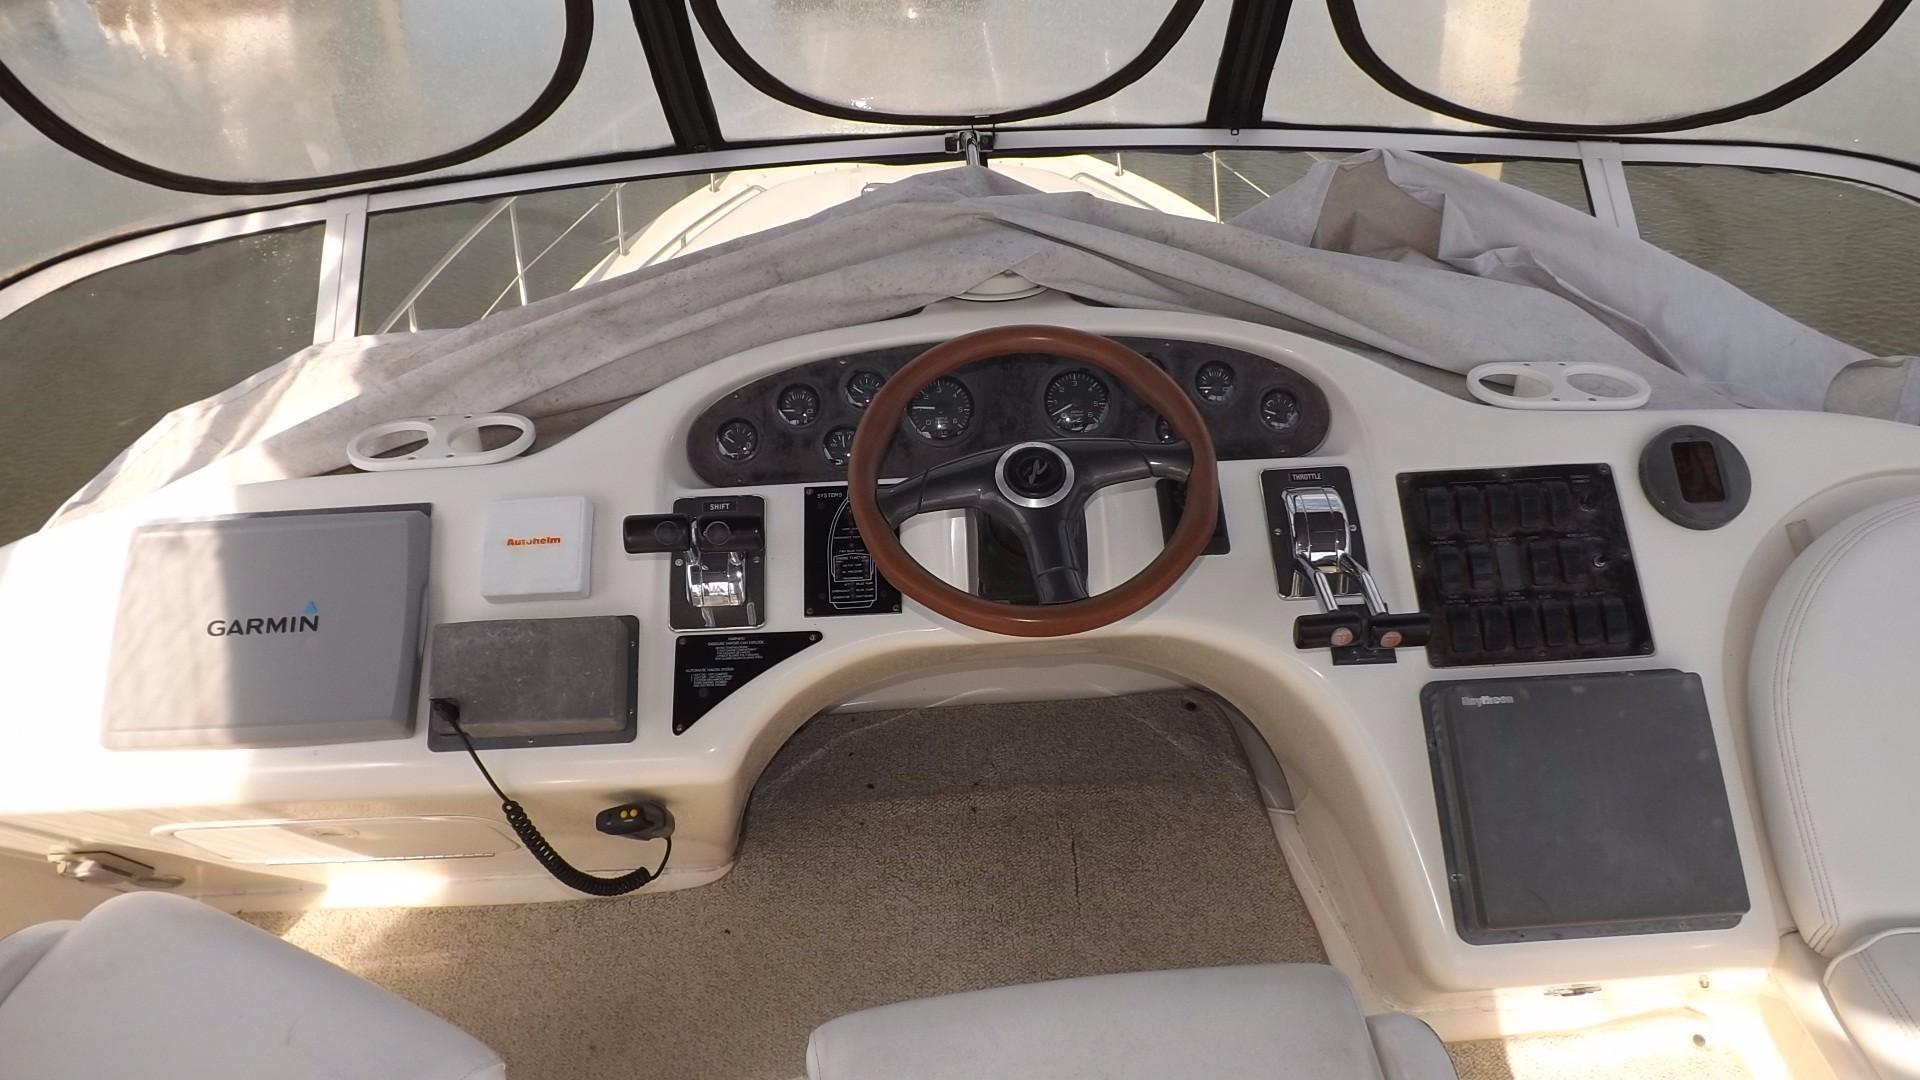 6231852_20170510134121679_1_XLARGE&w=924&h=693&t=1494452691000 1997 sea ray 400 sedan bridge a motor barco en venta  at crackthecode.co